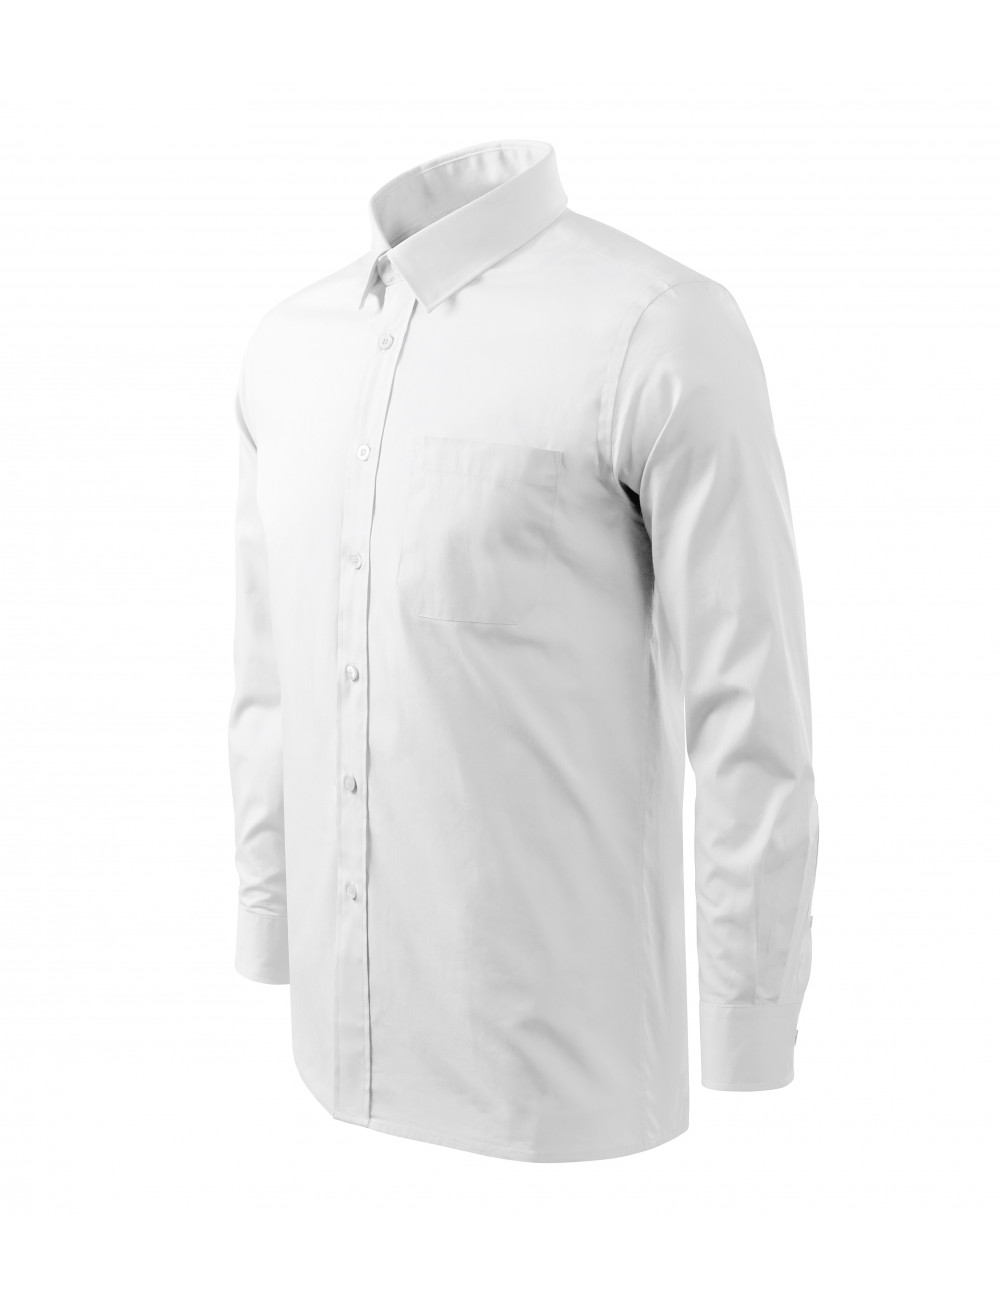 Adler MALFINI Koszula męska Style LS 209 biały